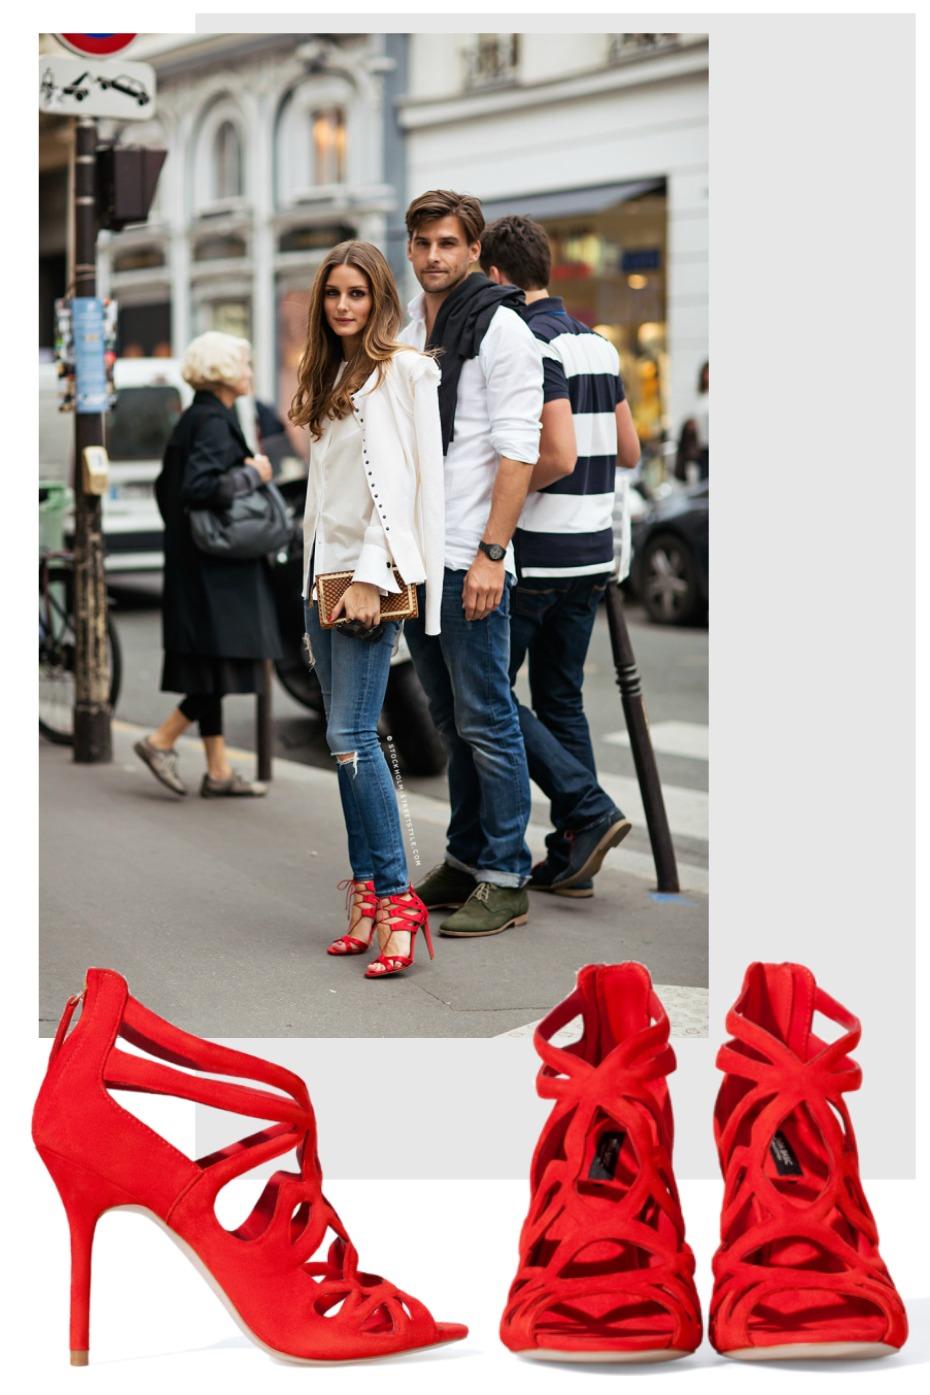 red heels_streetstyle_olivia palermo